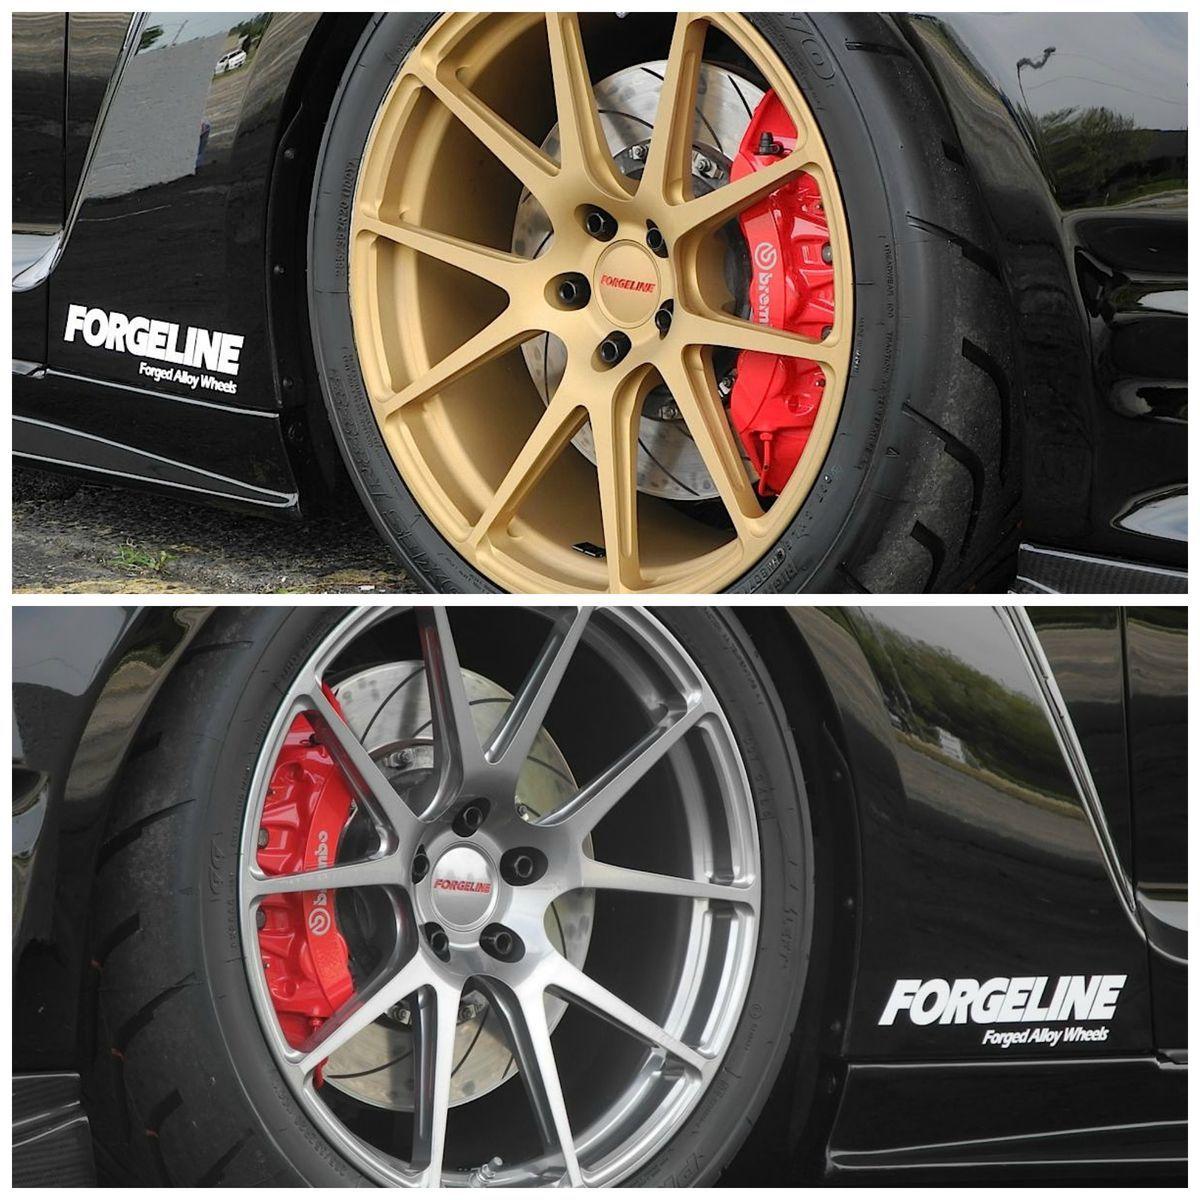 2012 Nissan GT-R | Forgeline One PIece Forged Monoblock GA1R Deep Cap Wheels on Doug Washburn's Nissan GT-R